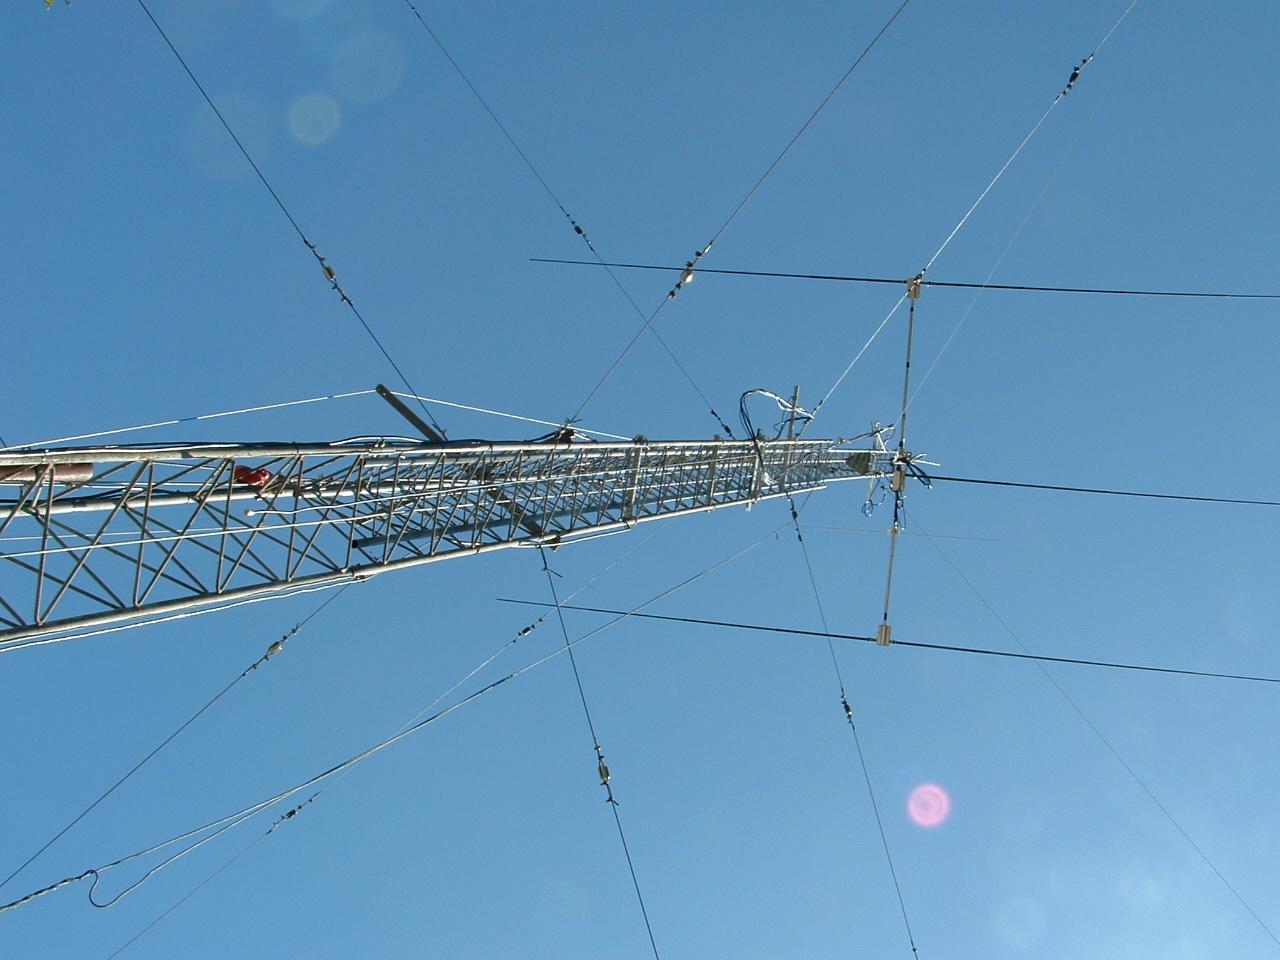 KI7M - Callsign Lookup by QRZ Ham Radio